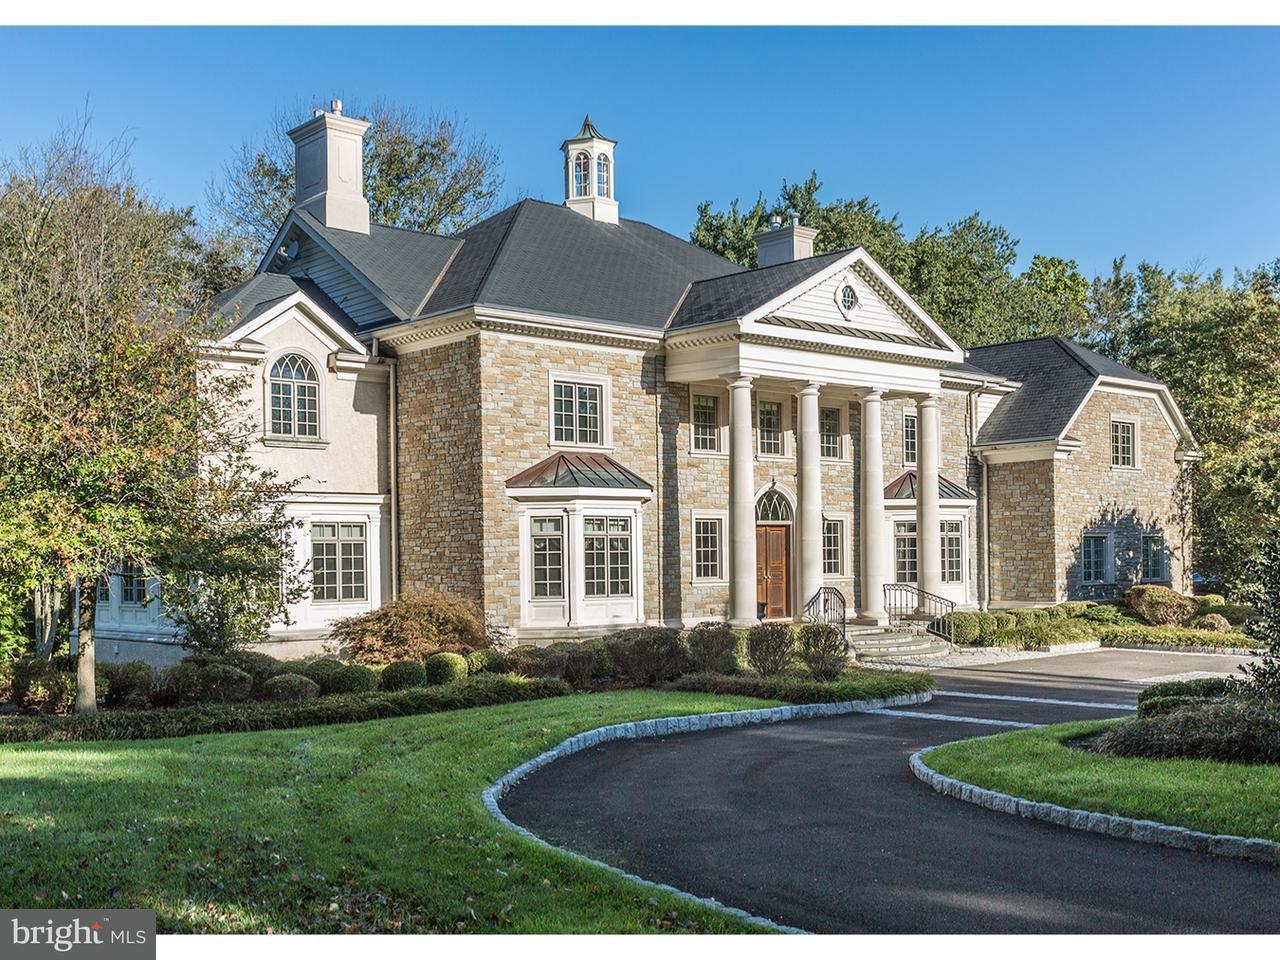 Single Family Home for Sale at 901 BRUSHTOWN Road Ambler, Pennsylvania 19002 United States